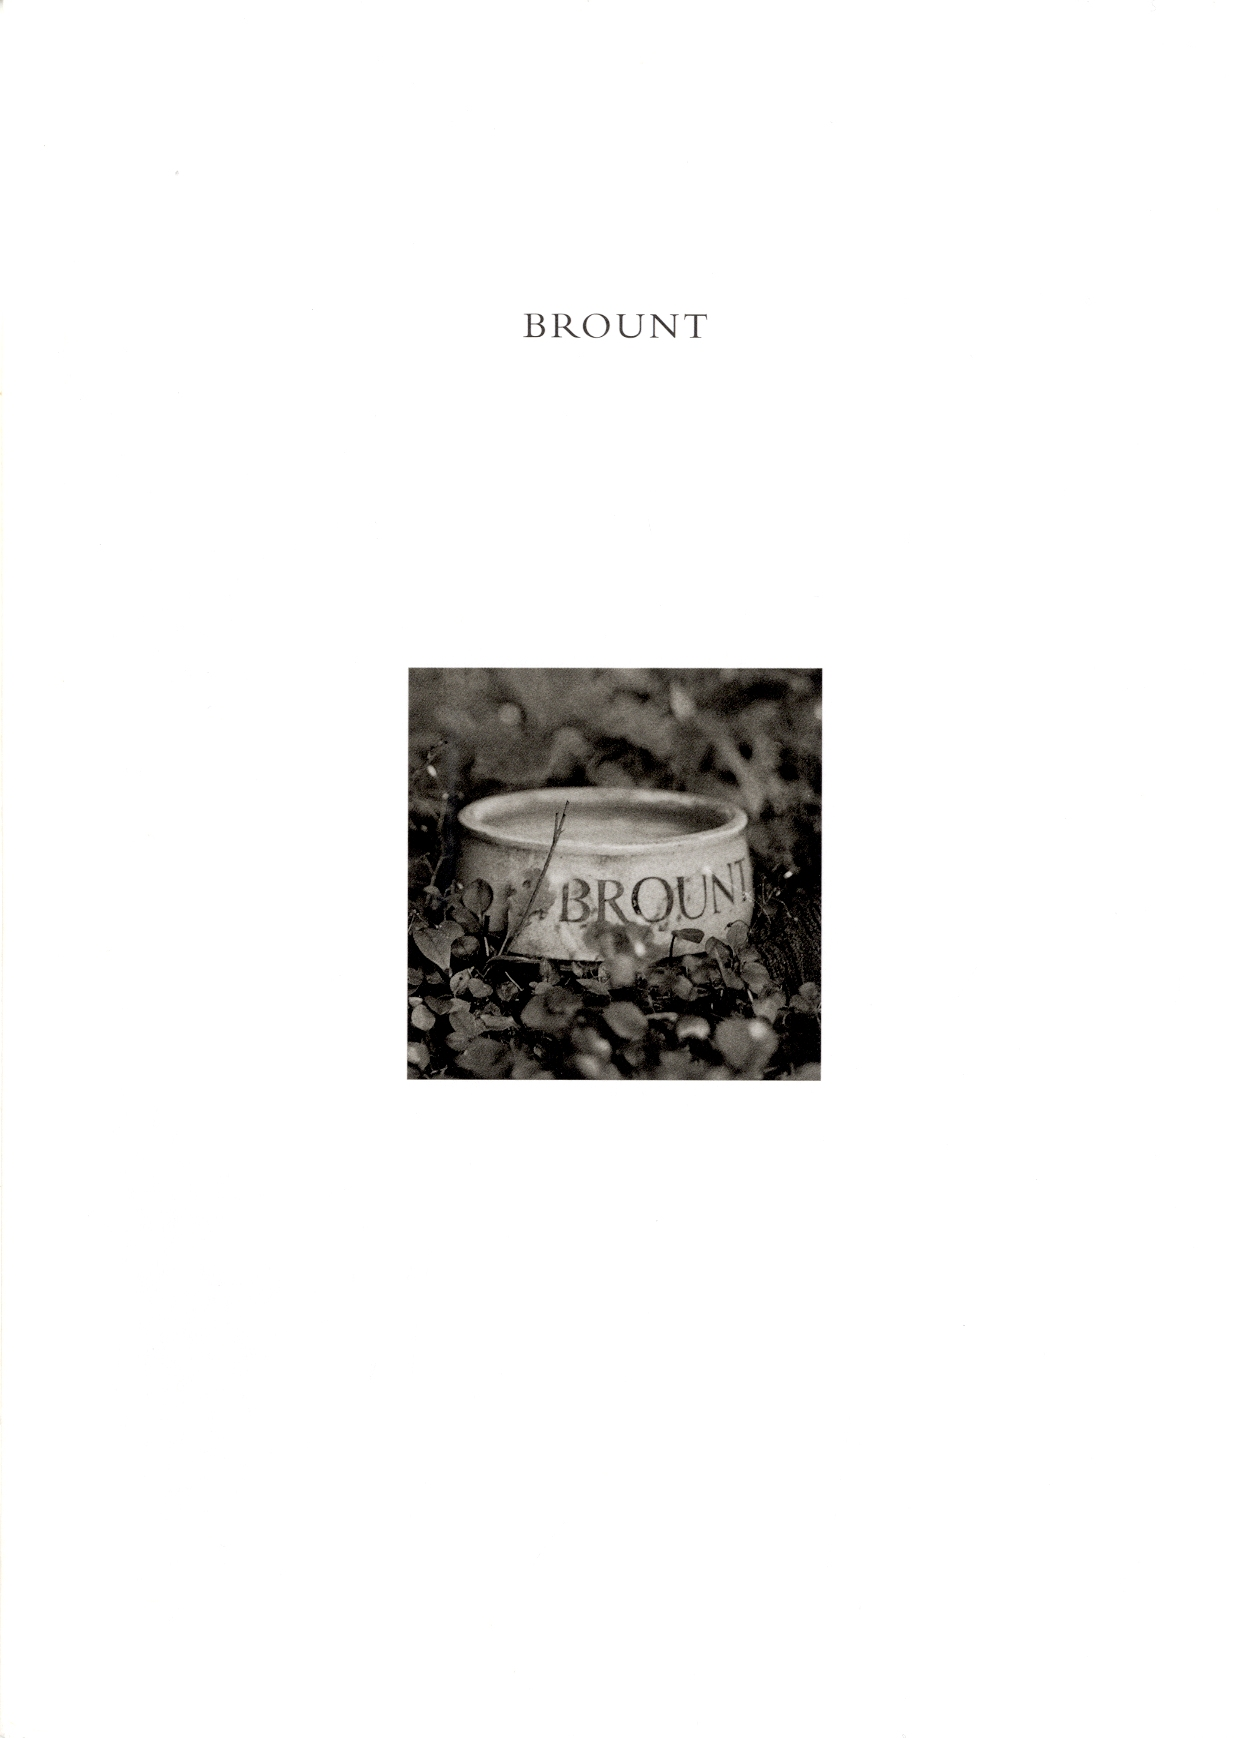 Brount: an idyll